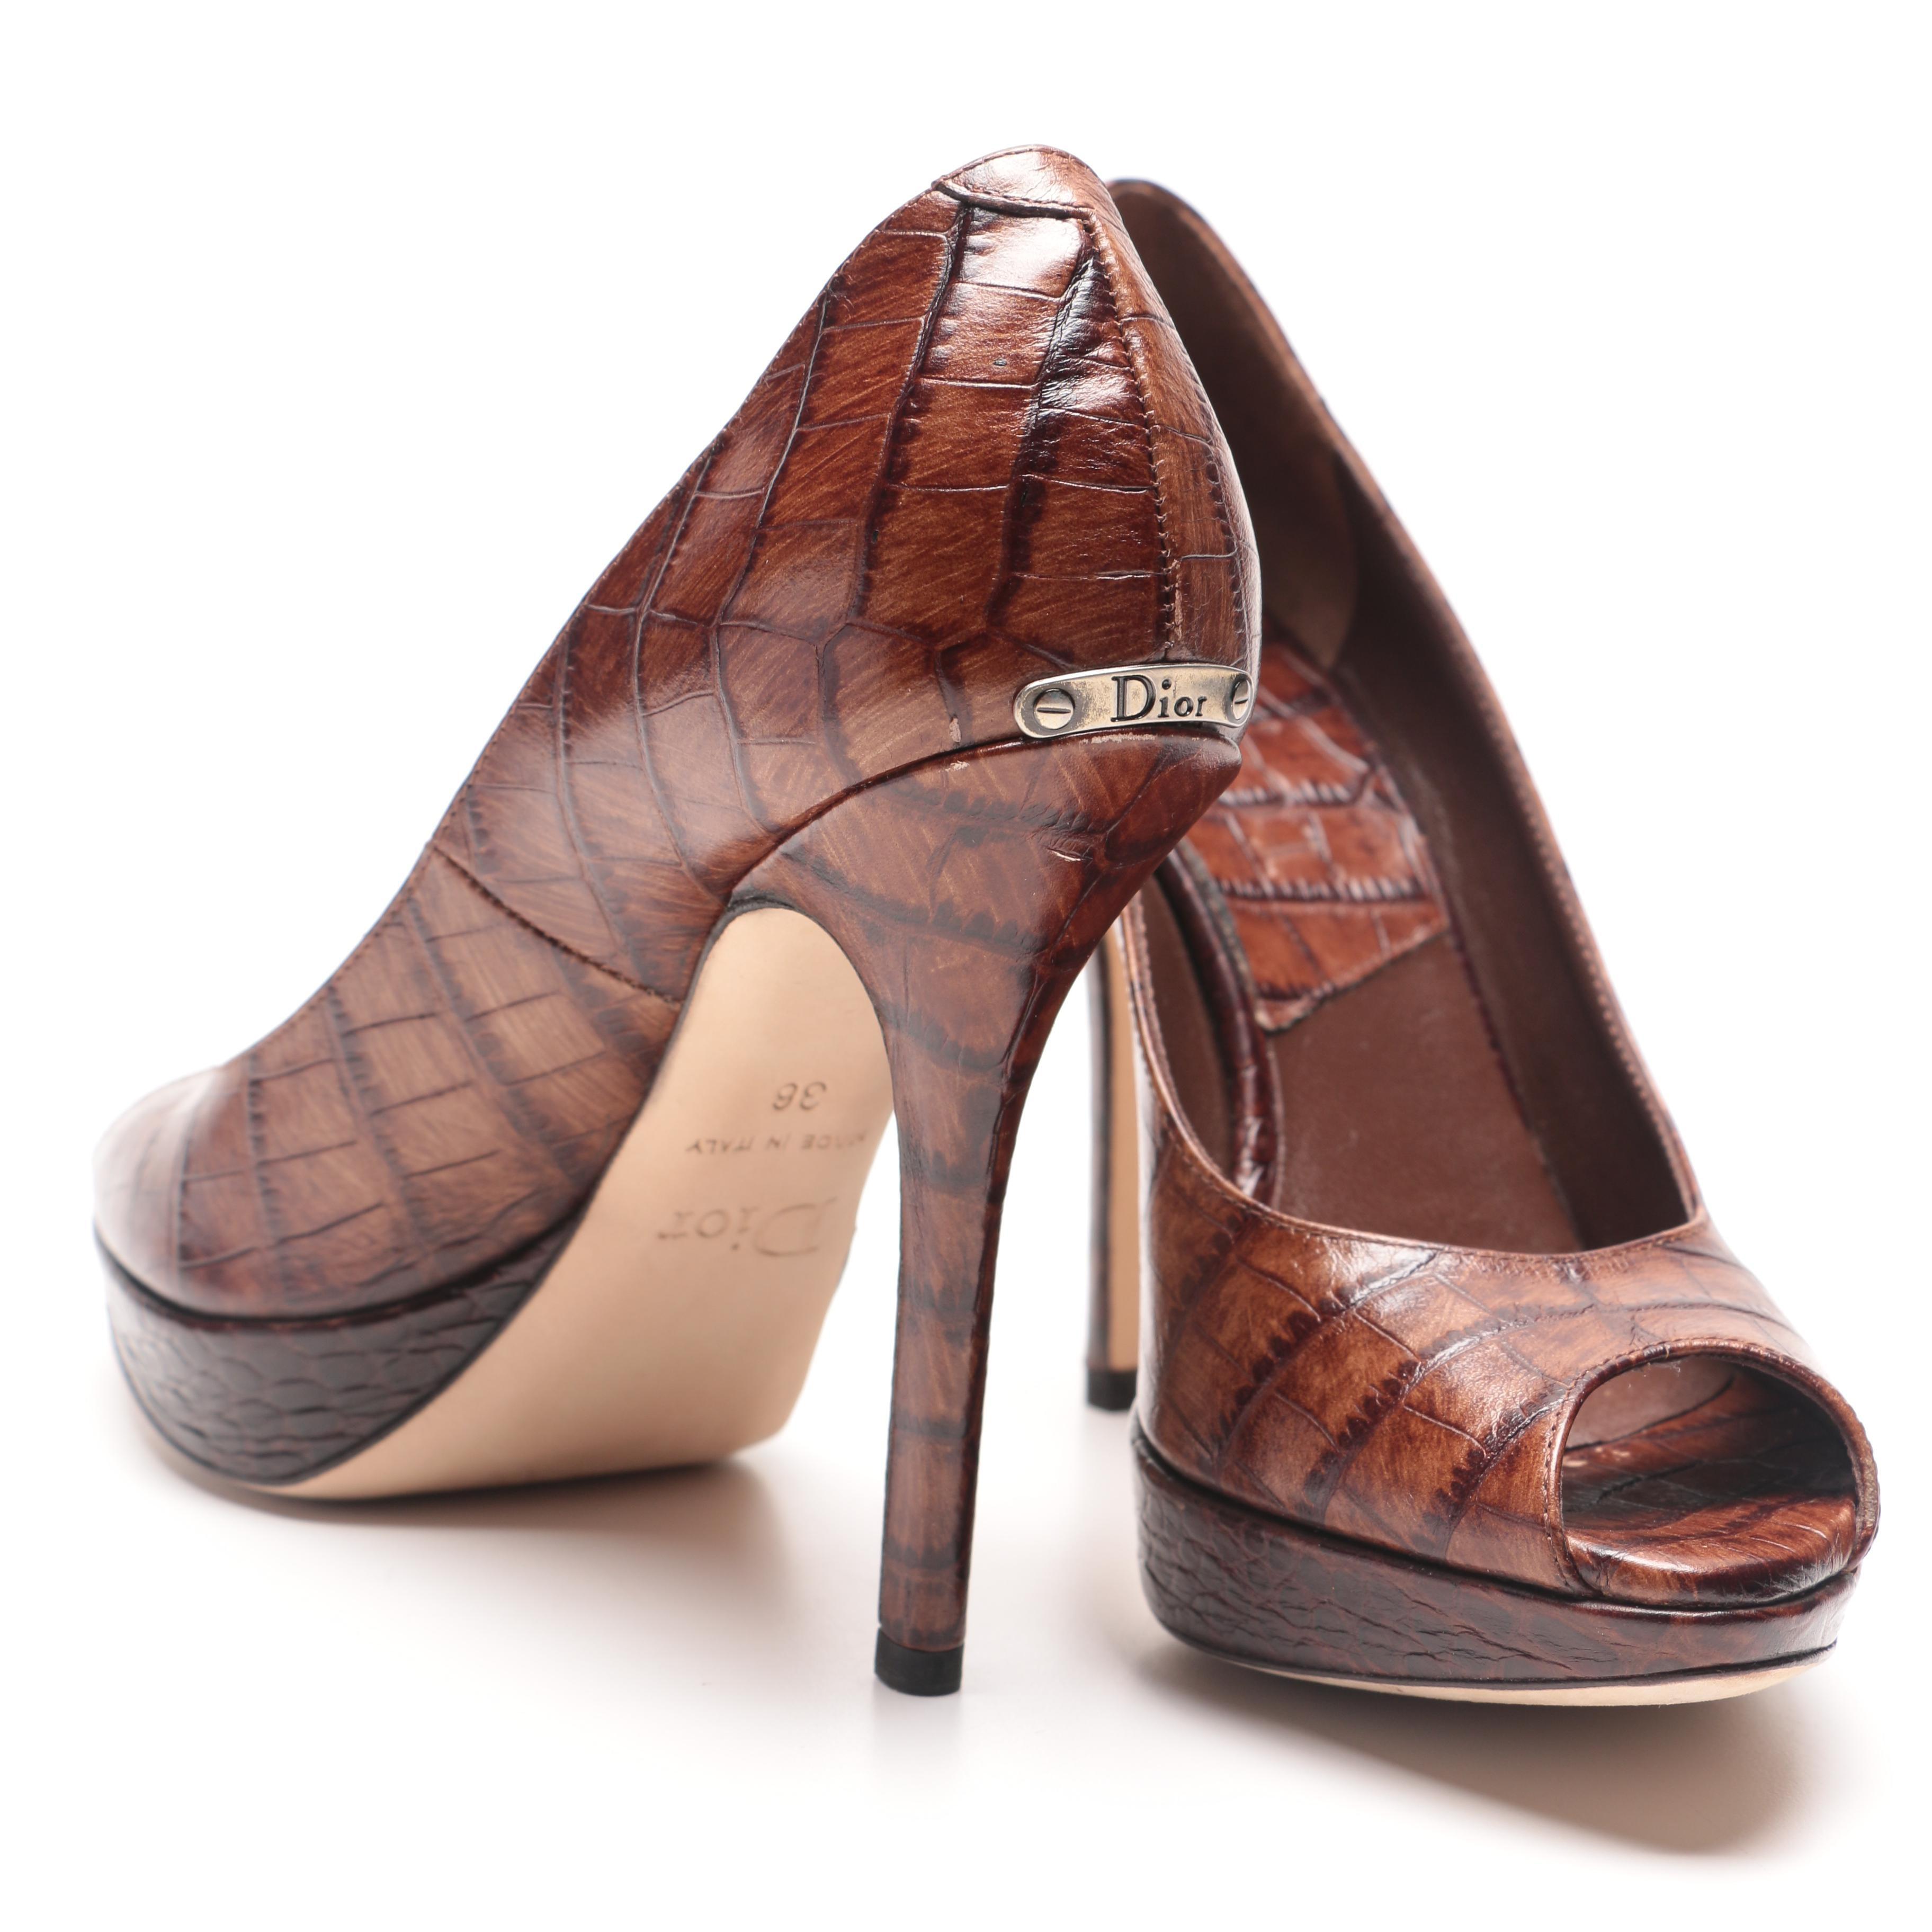 Dior Embossed Leather Peep Toe Heels